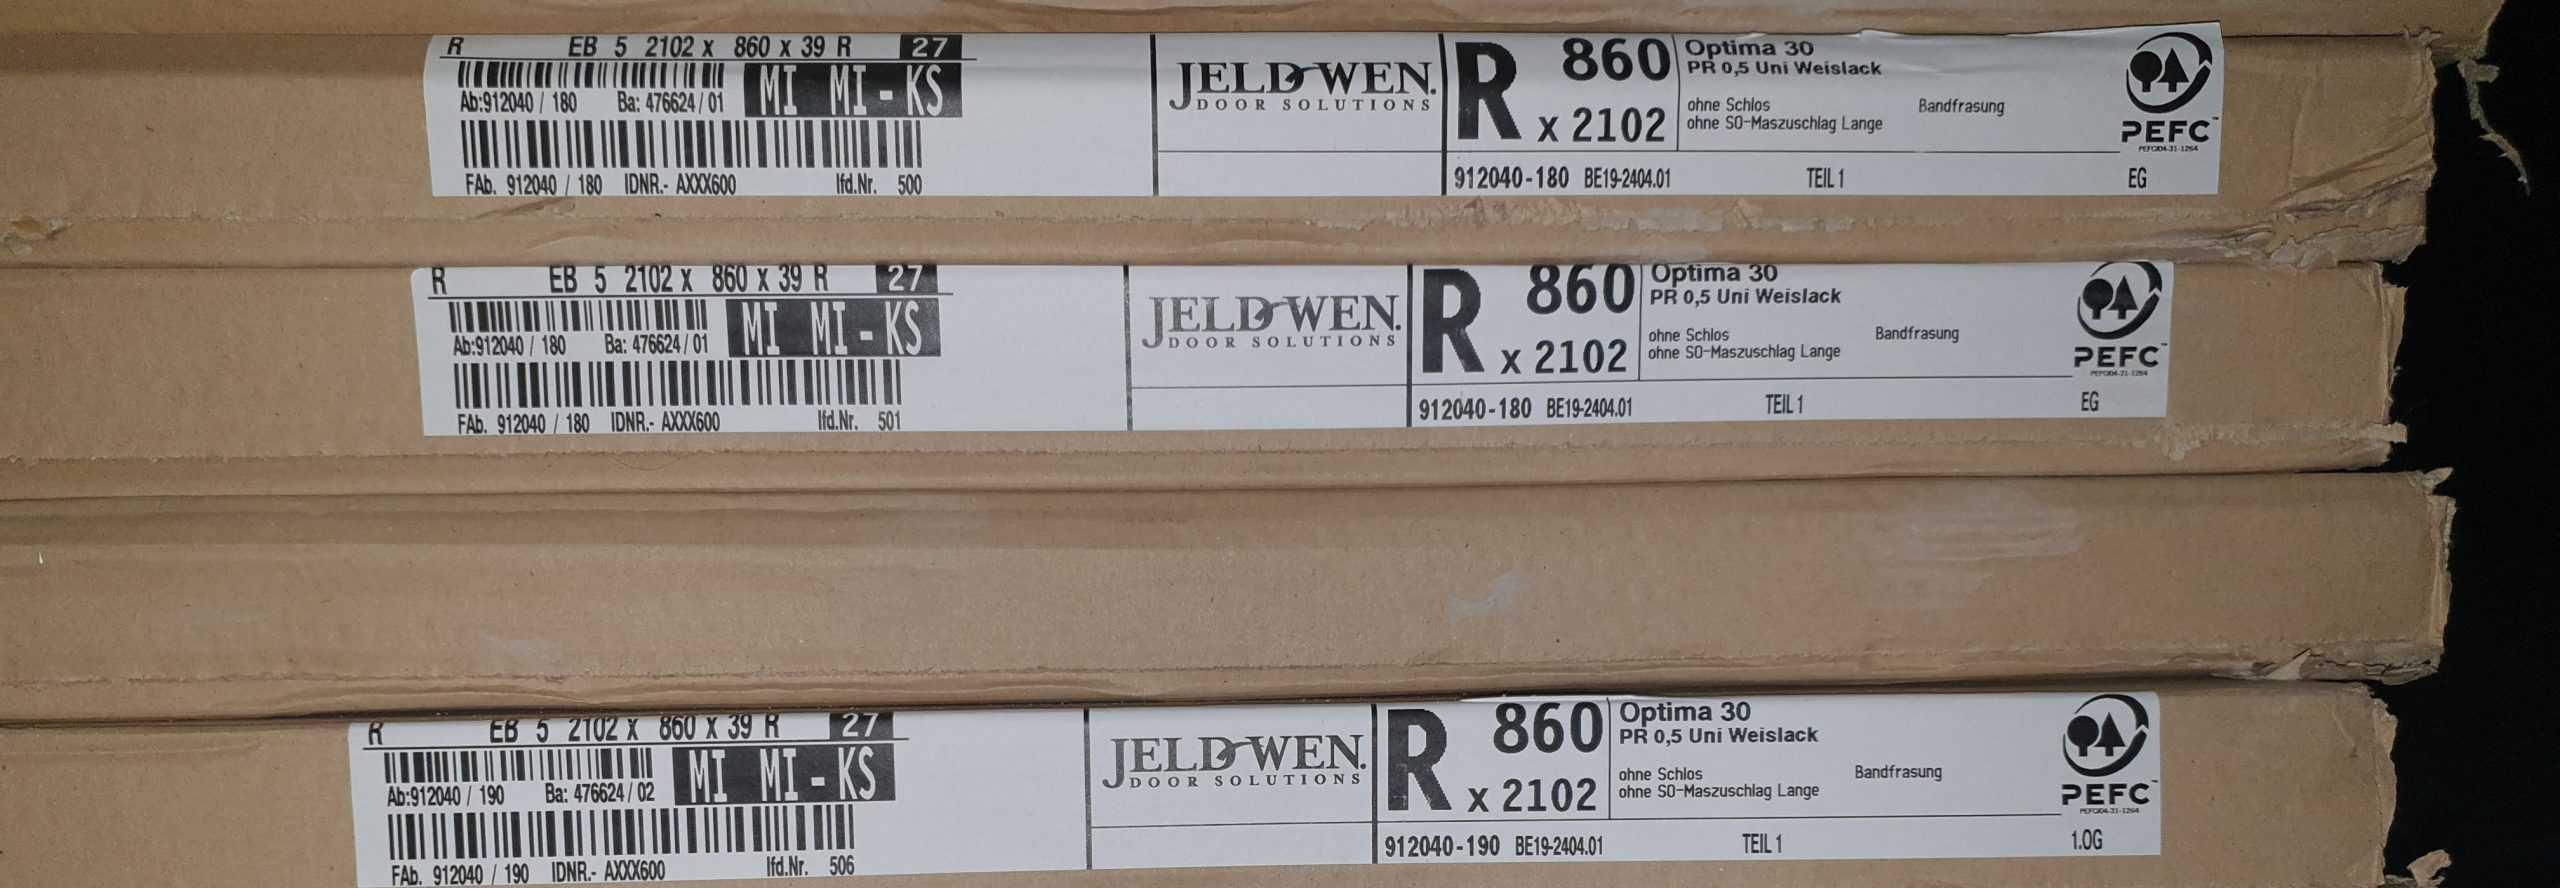 Jeld-Wen Modell Optima 30 Uni Weiß Lack